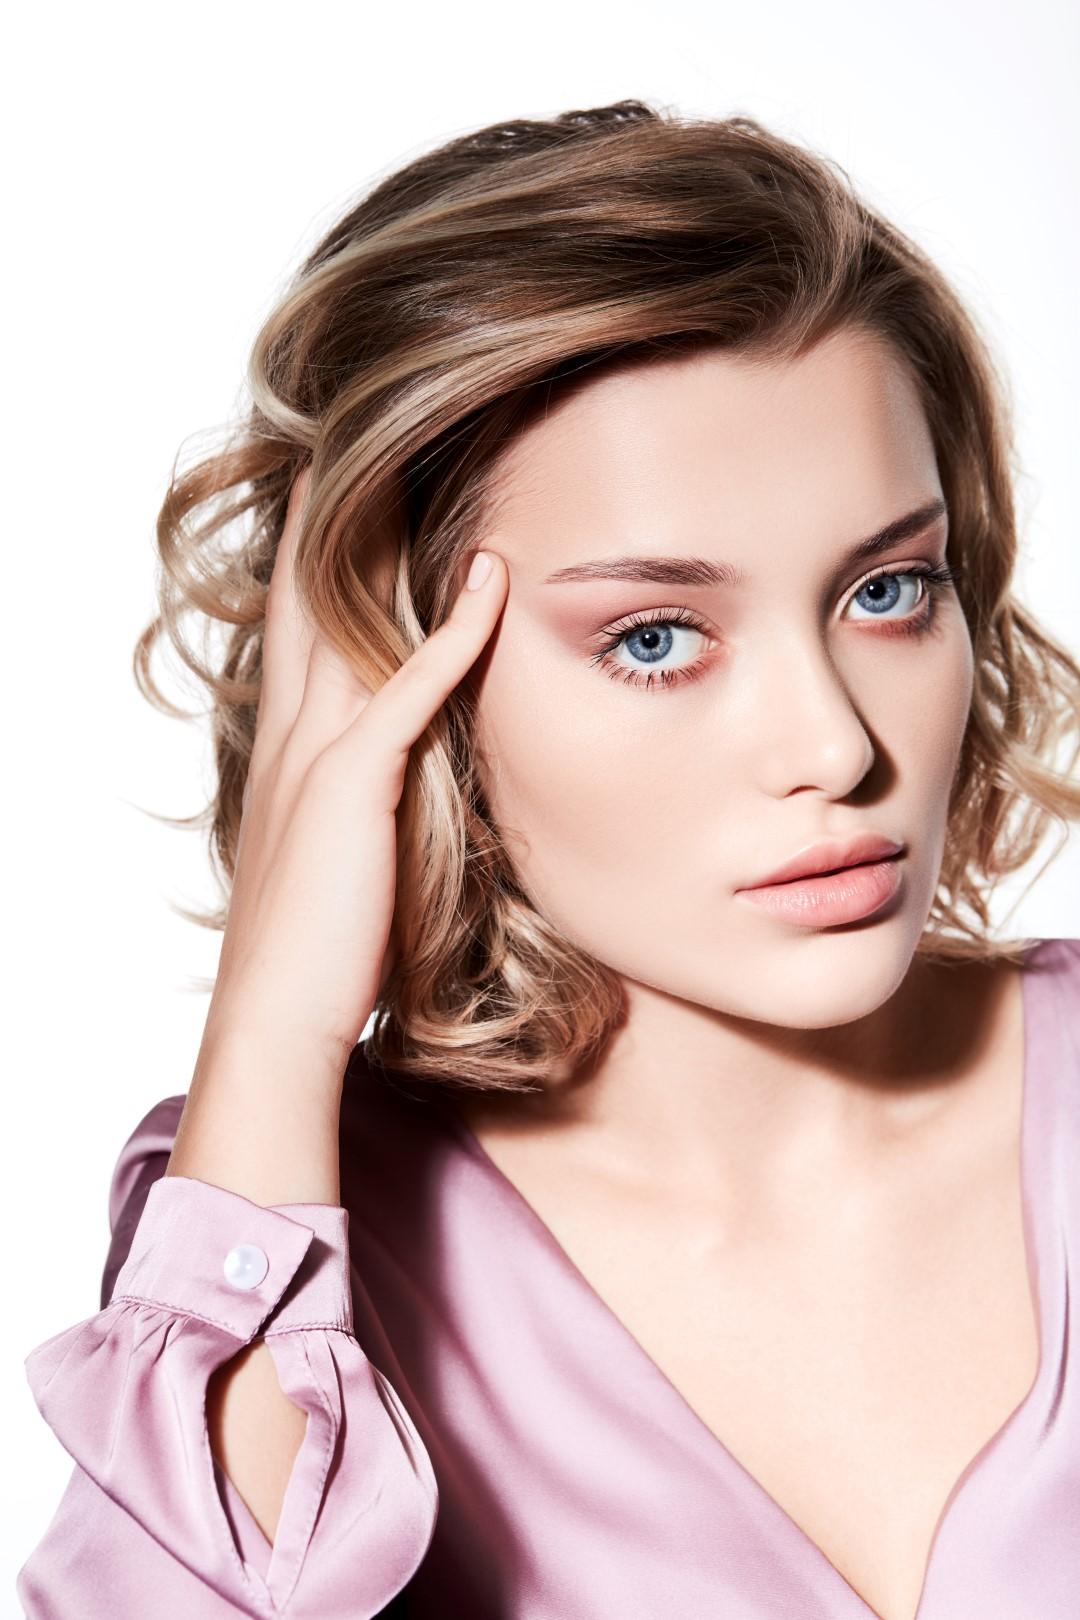 Визажист хомякова, ирина хомякова, Школа макияжа, курсы макияжа, мейкакп сопровождение, top визажист